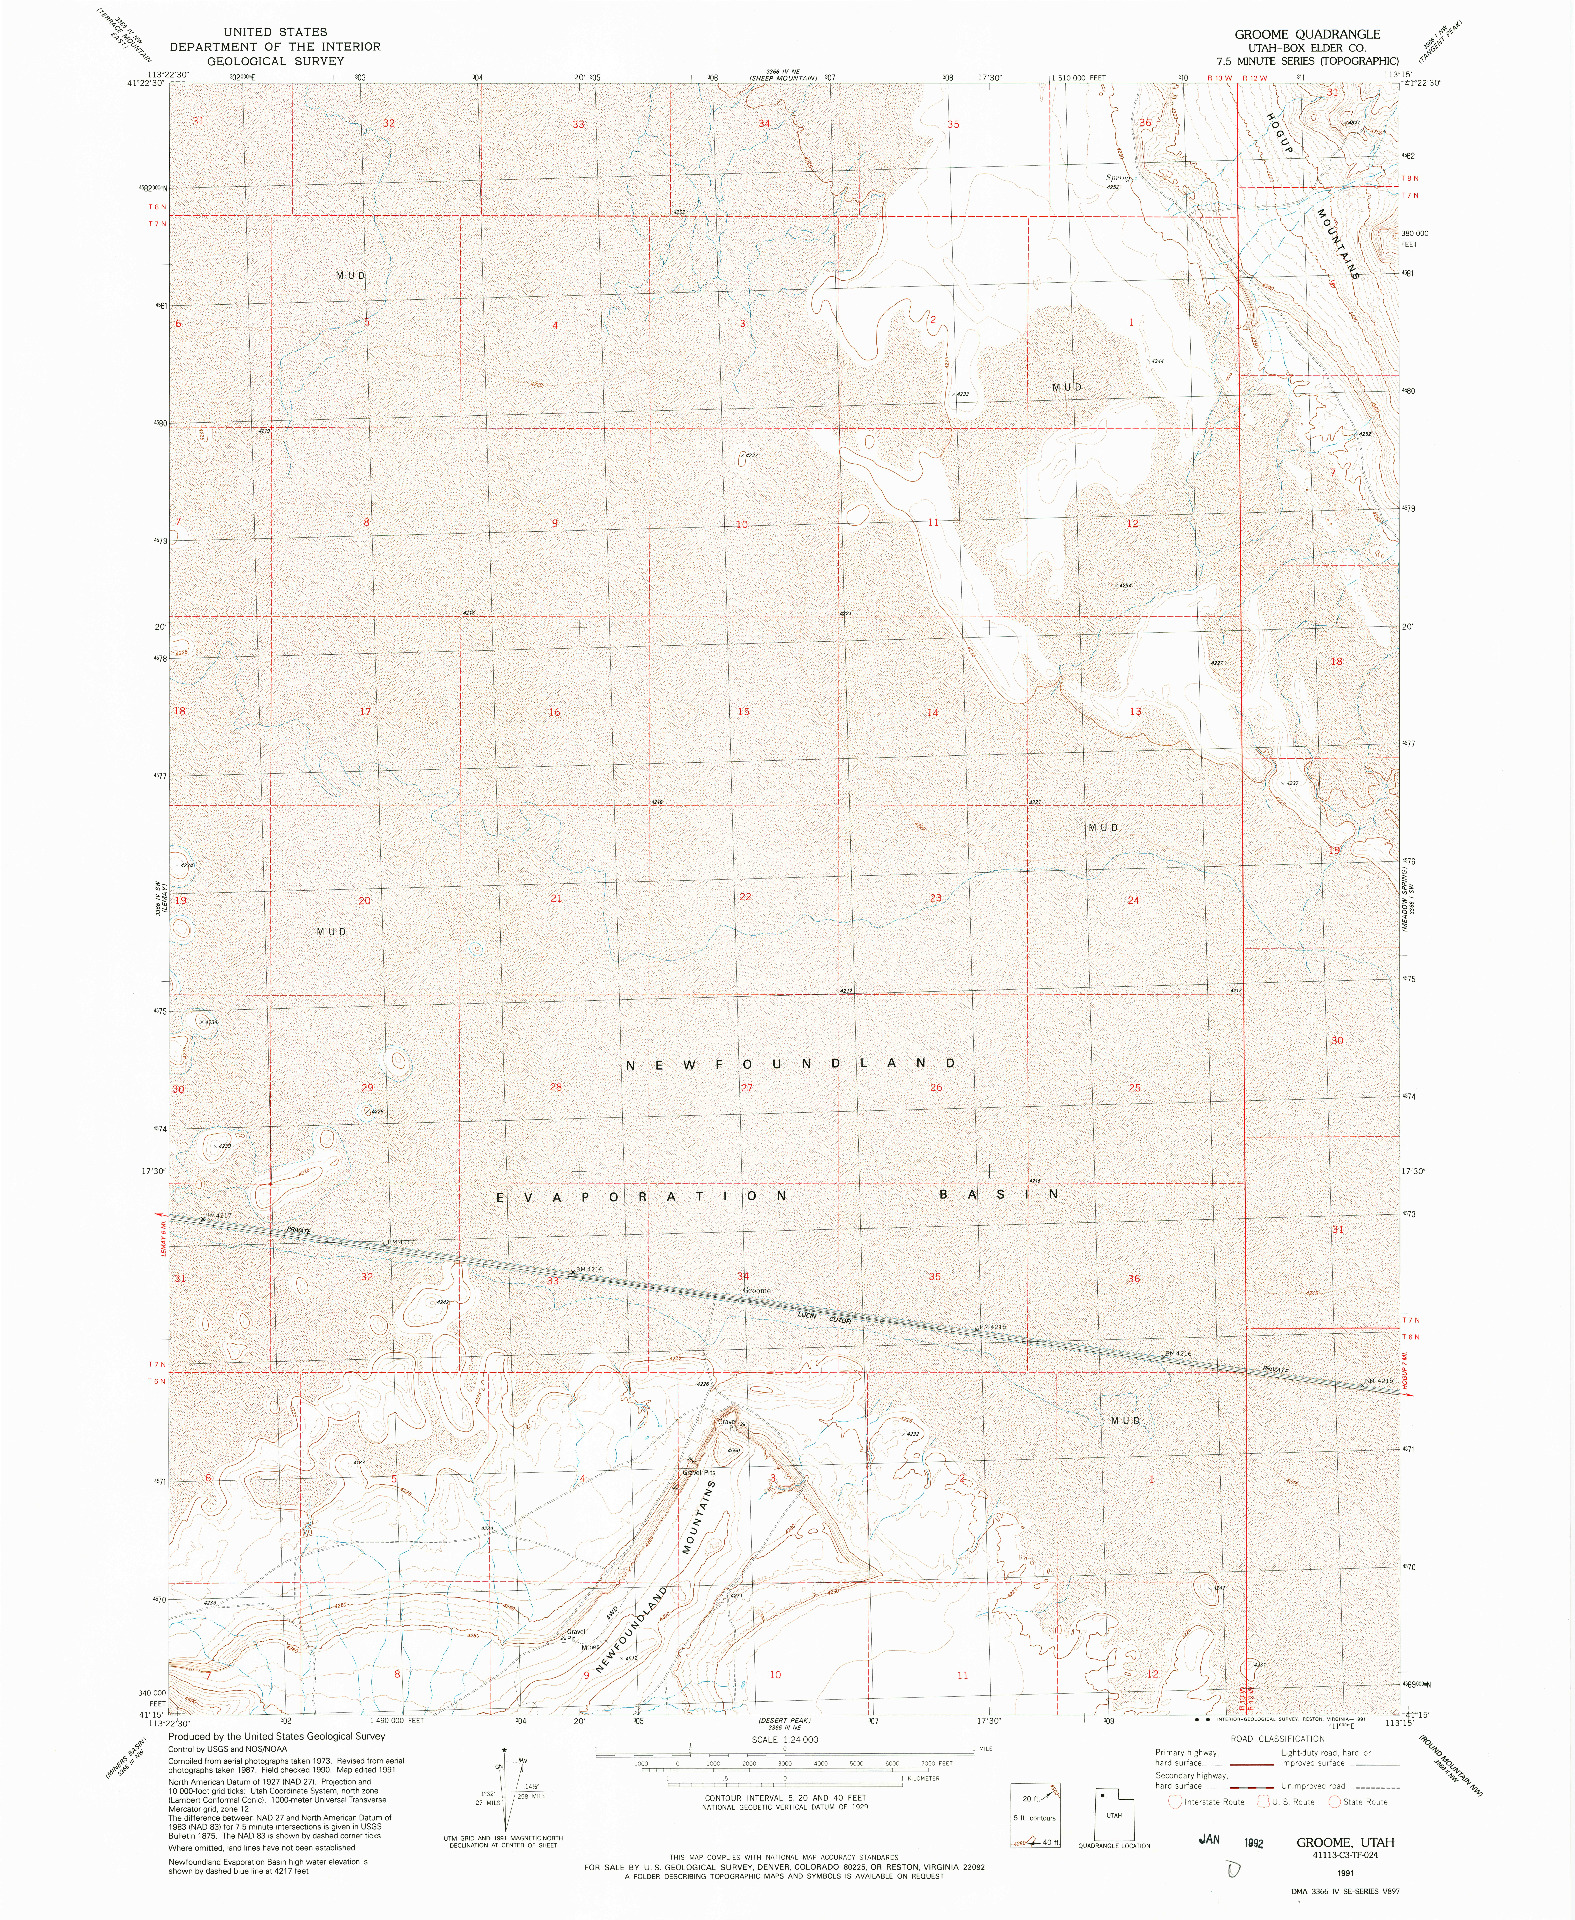 USGS 1:24000-SCALE QUADRANGLE FOR GROOME, UT 1991